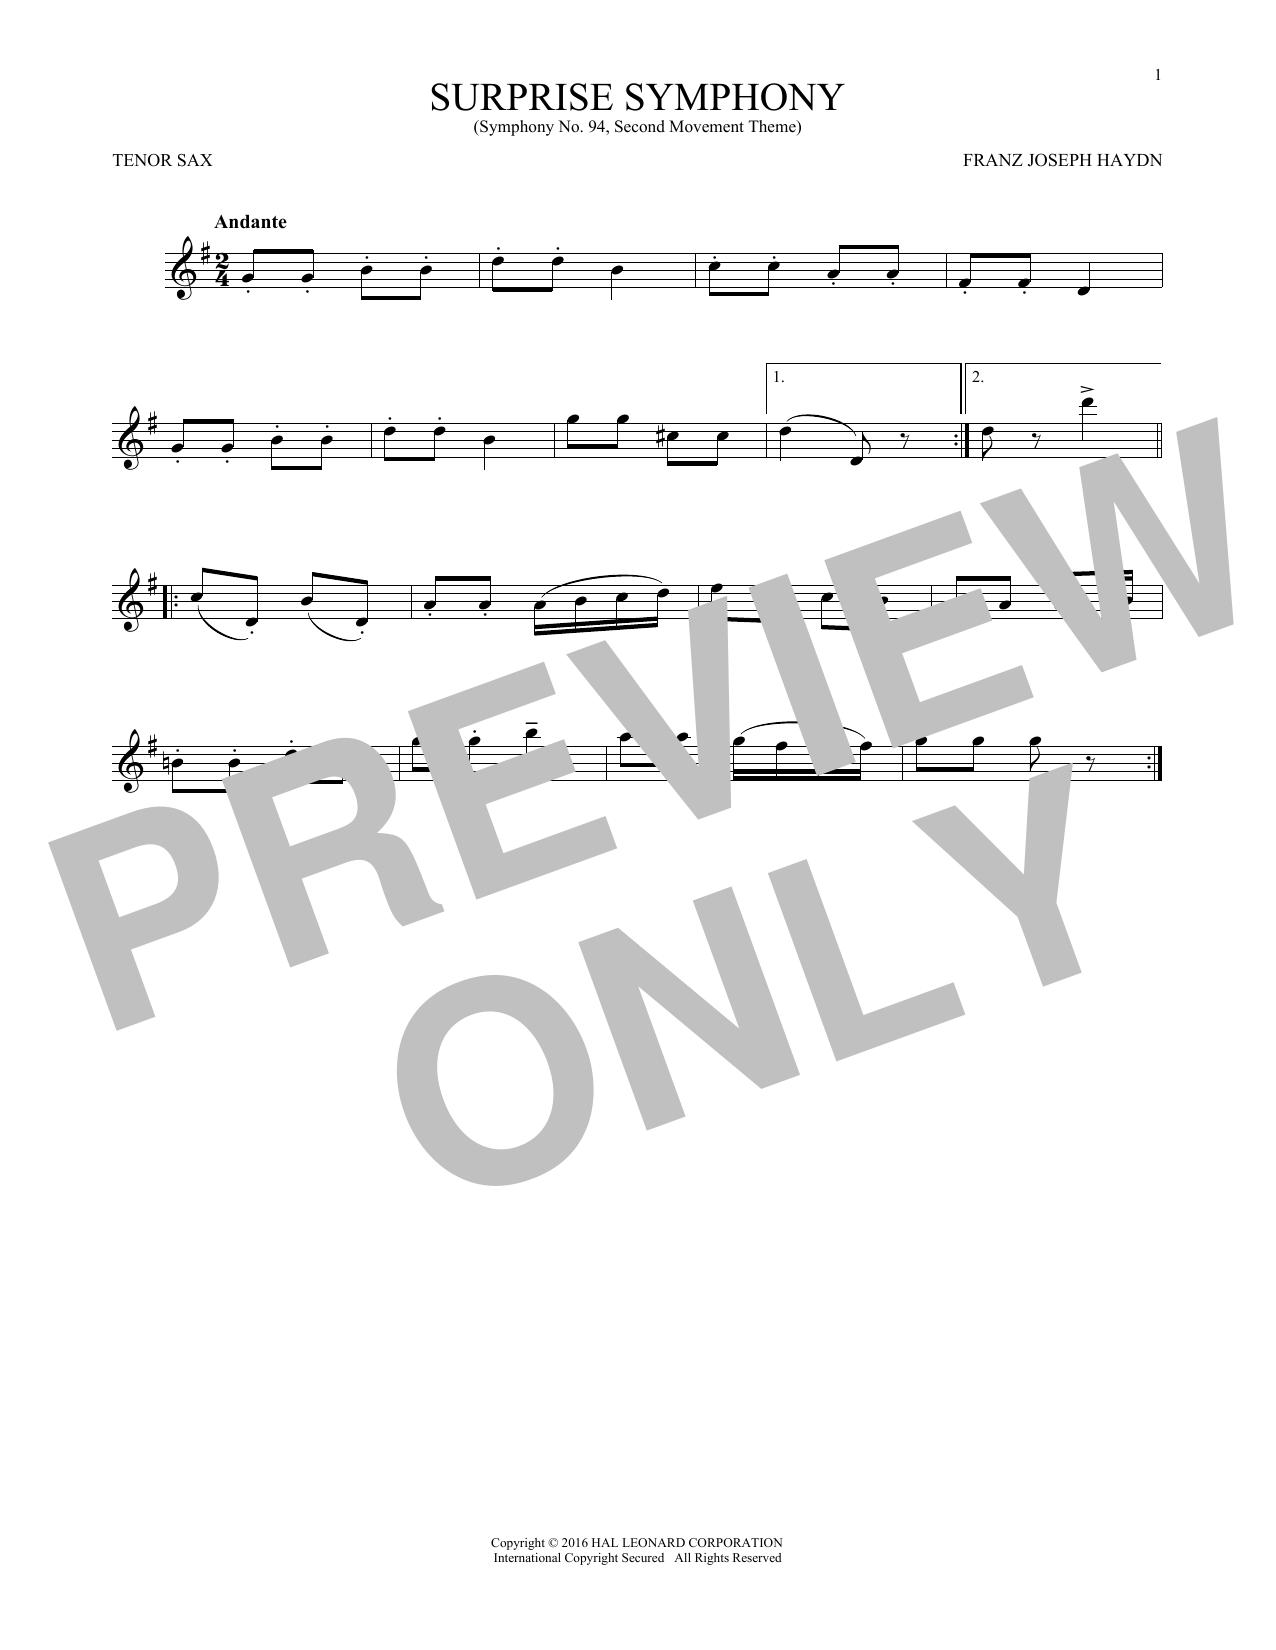 The Surprise Symphony (Tenor Sax Solo)